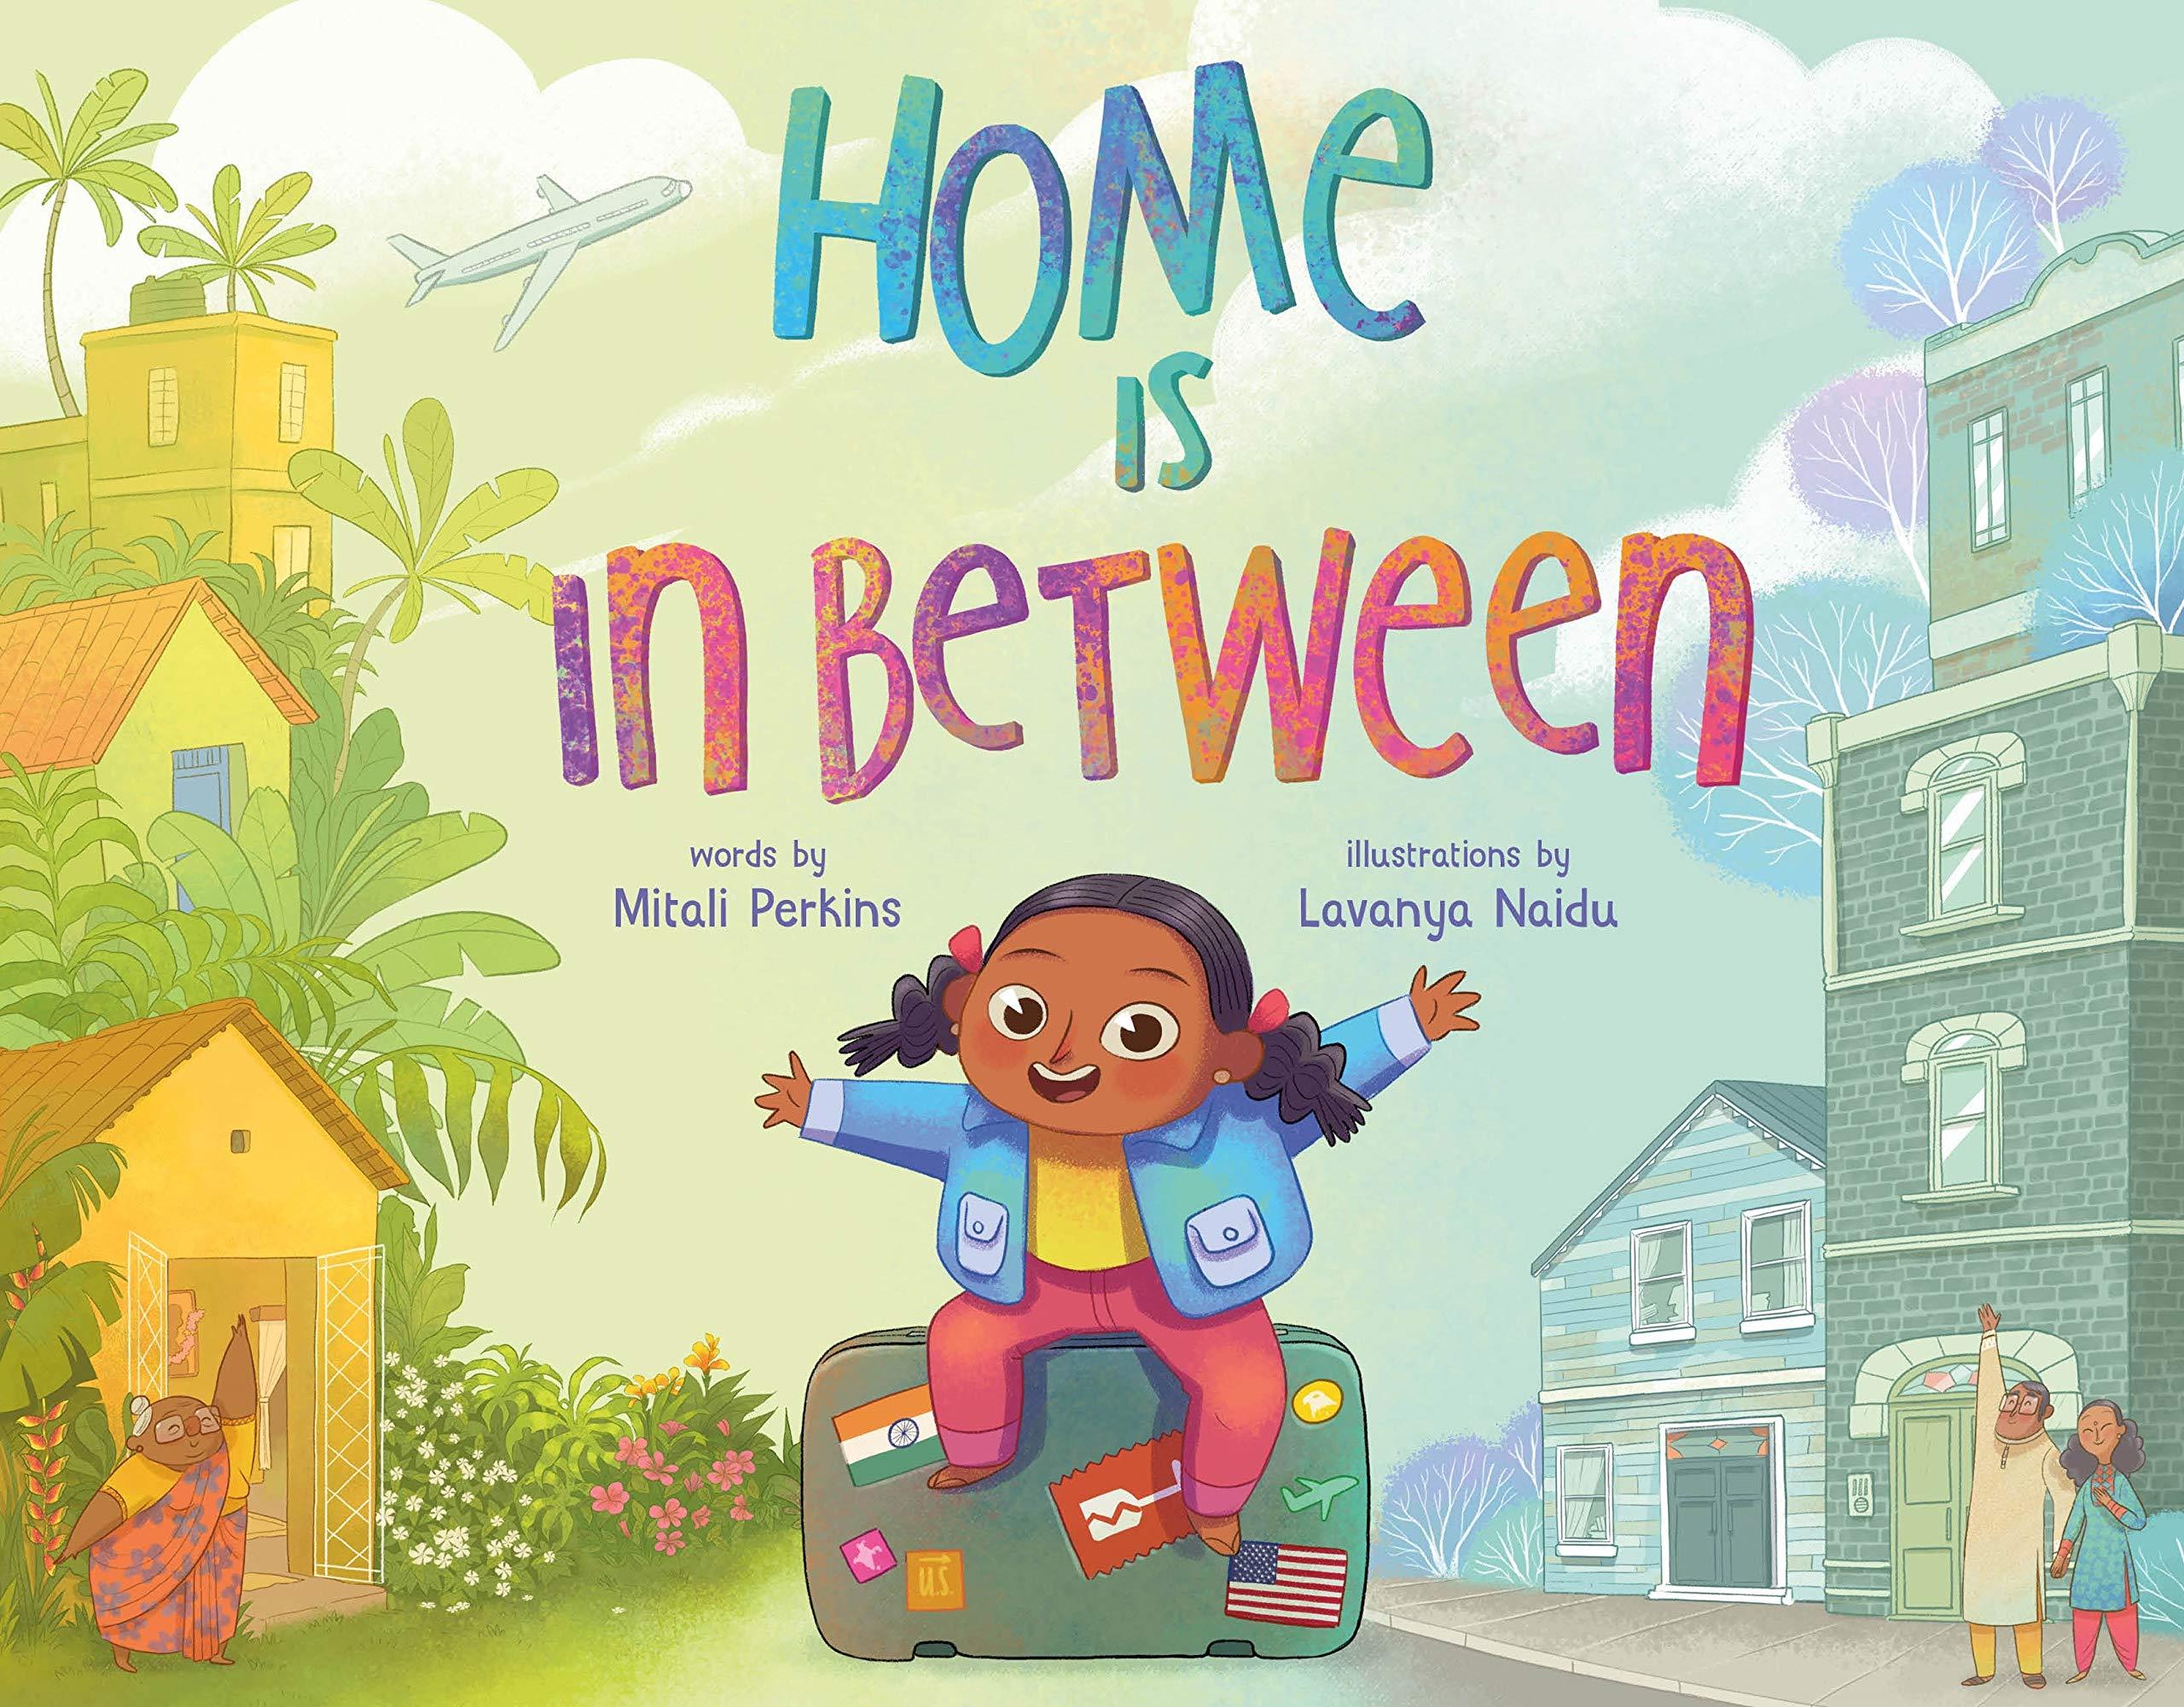 Amazon.com: Home Is in Between (9780374303679): Perkins, Mitali, Naidu,  Lavanya: Books